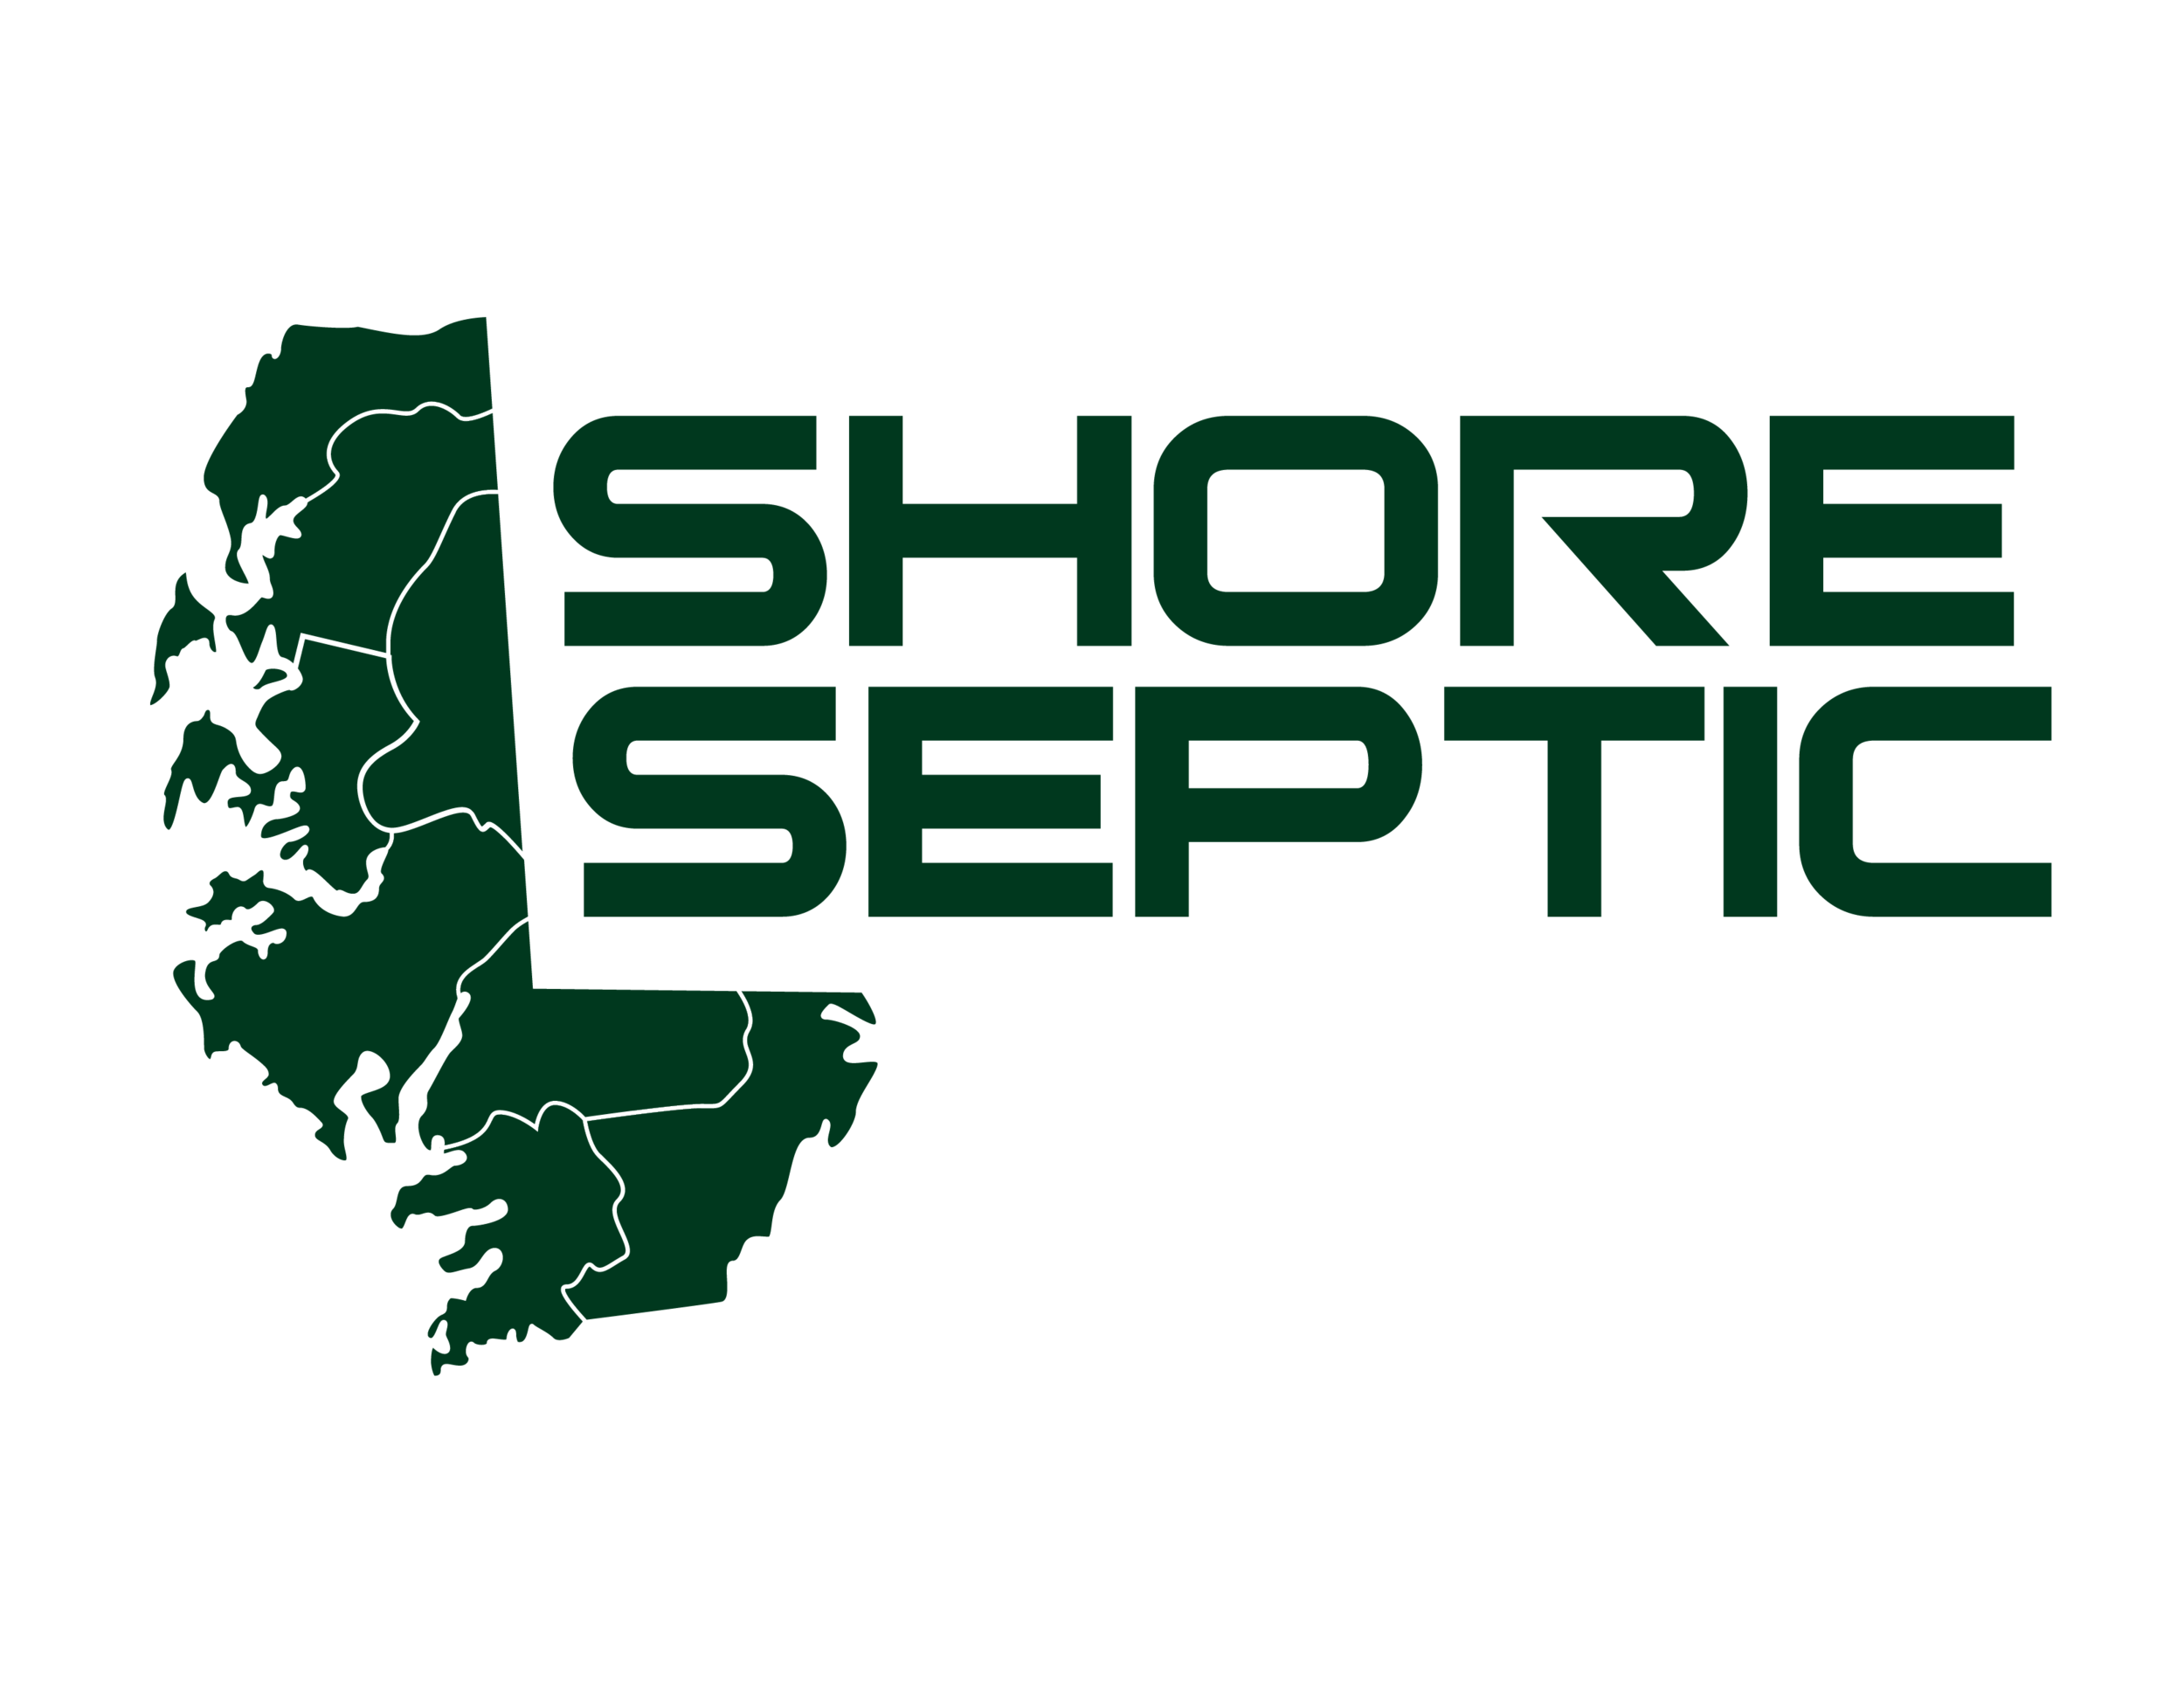 shore_septic_logo-01.png